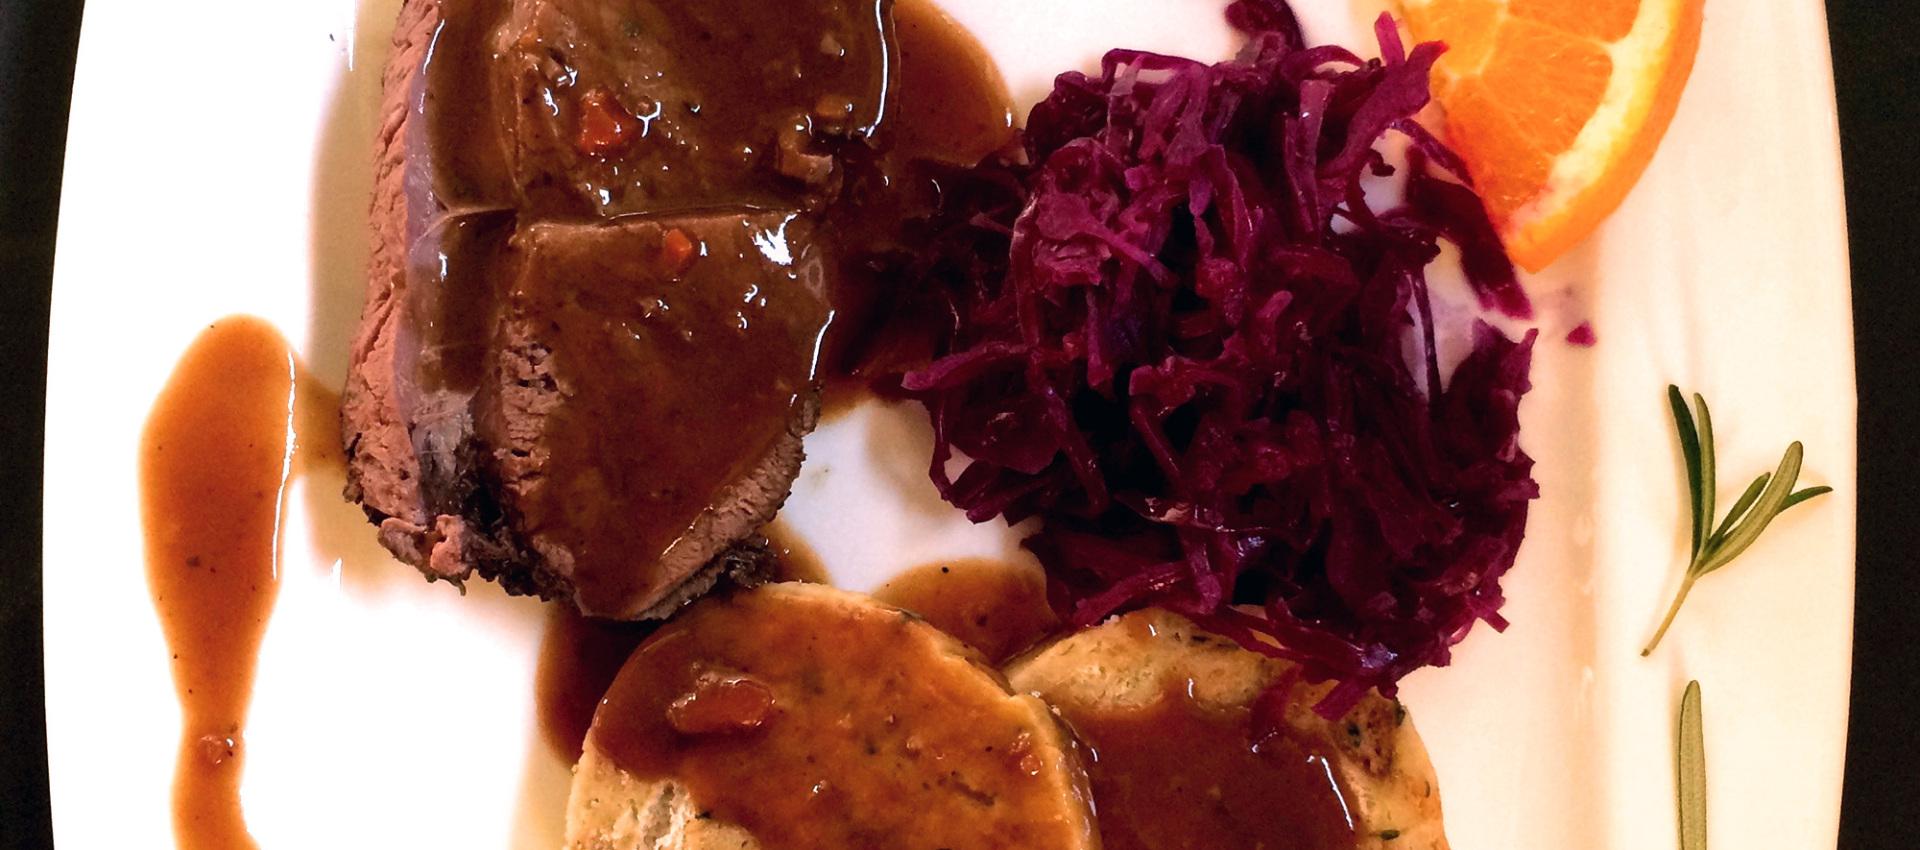 Rezept Rentier Braten mit Serviettenknödeln und Blauchkraut - Kochbock.de